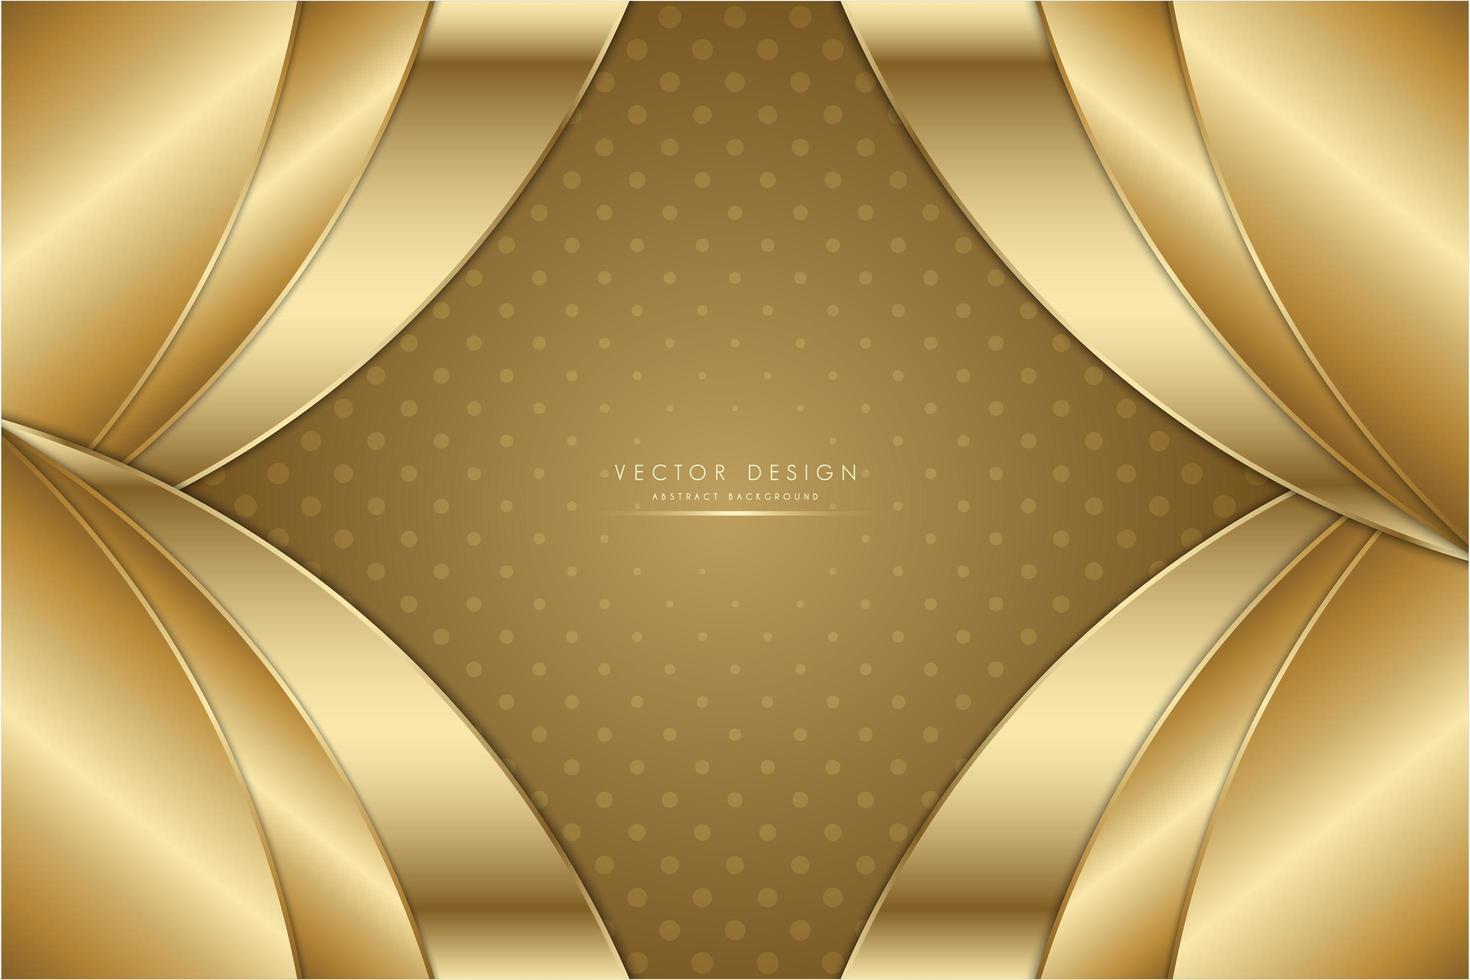 sfondo di pannelli a strati curvi metallici dorati. vettore